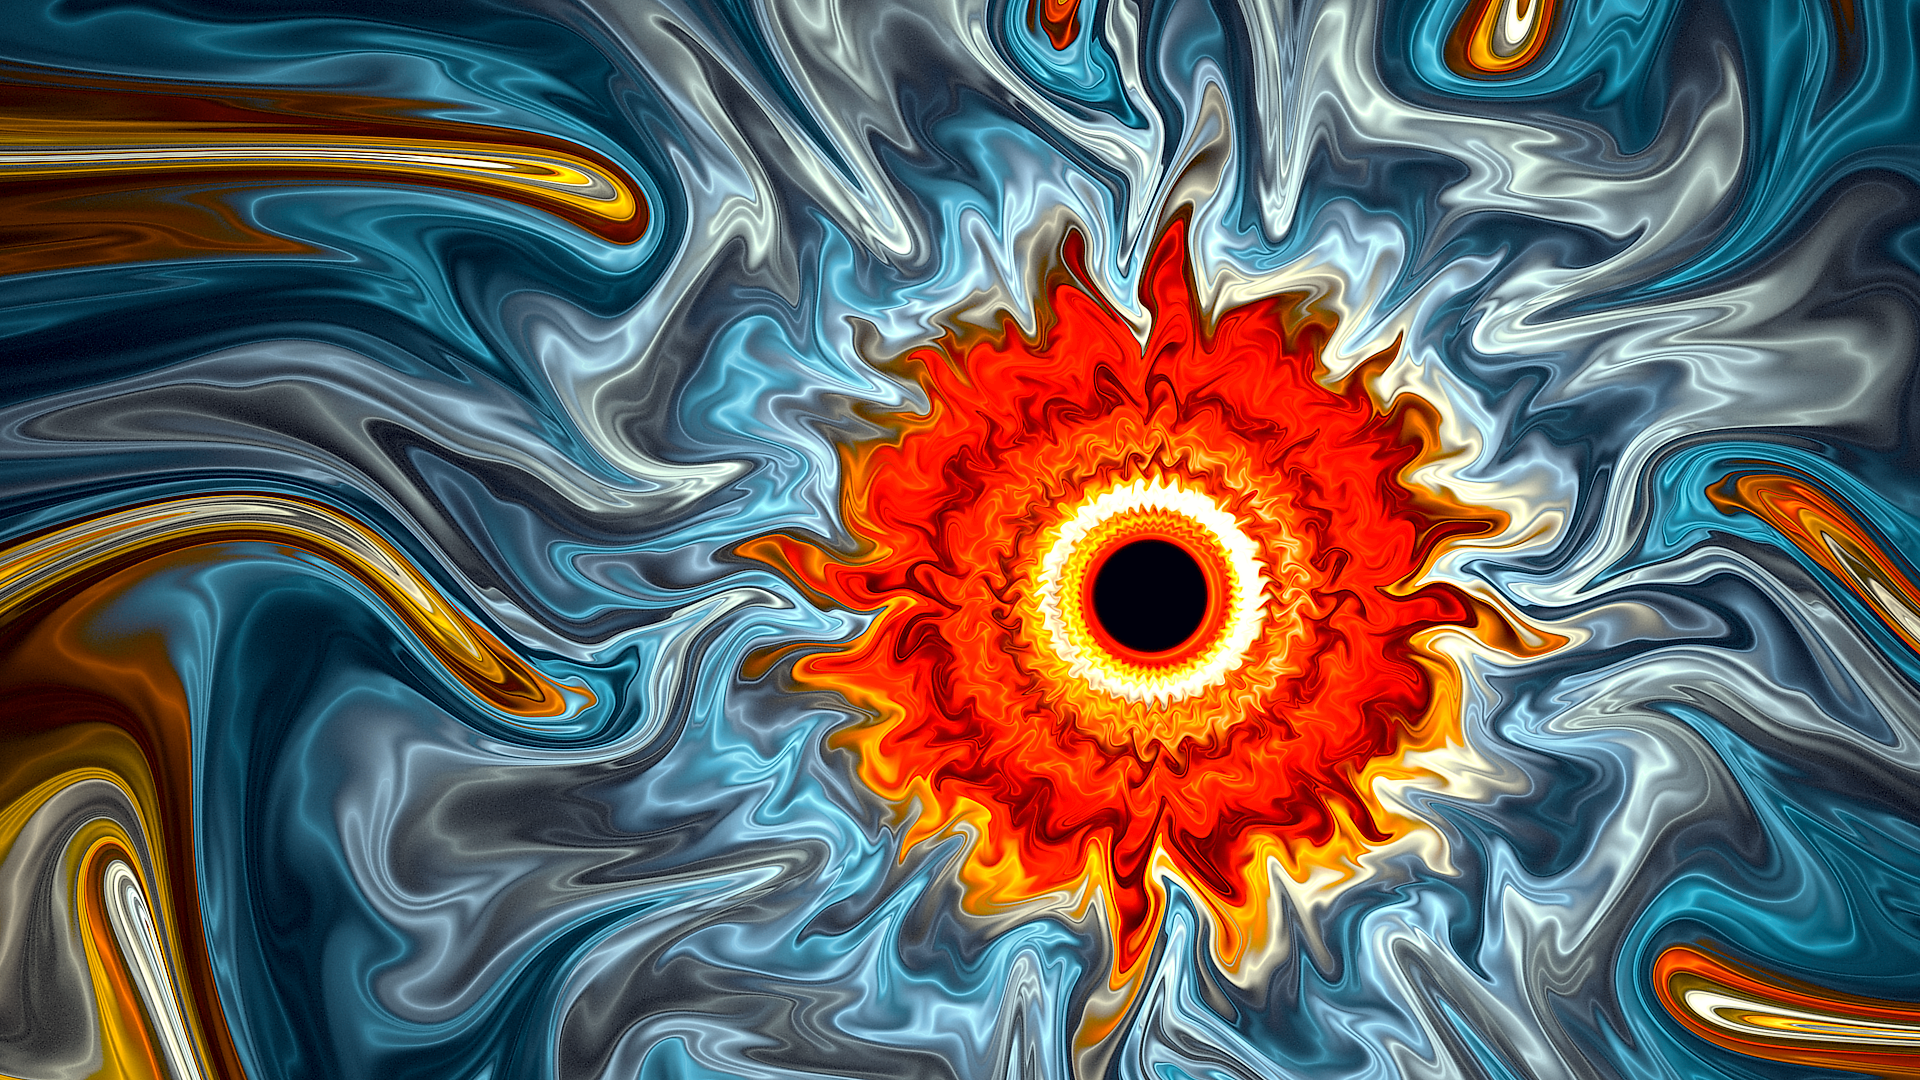 Black Hole Sun by SallySlips on DeviantArt